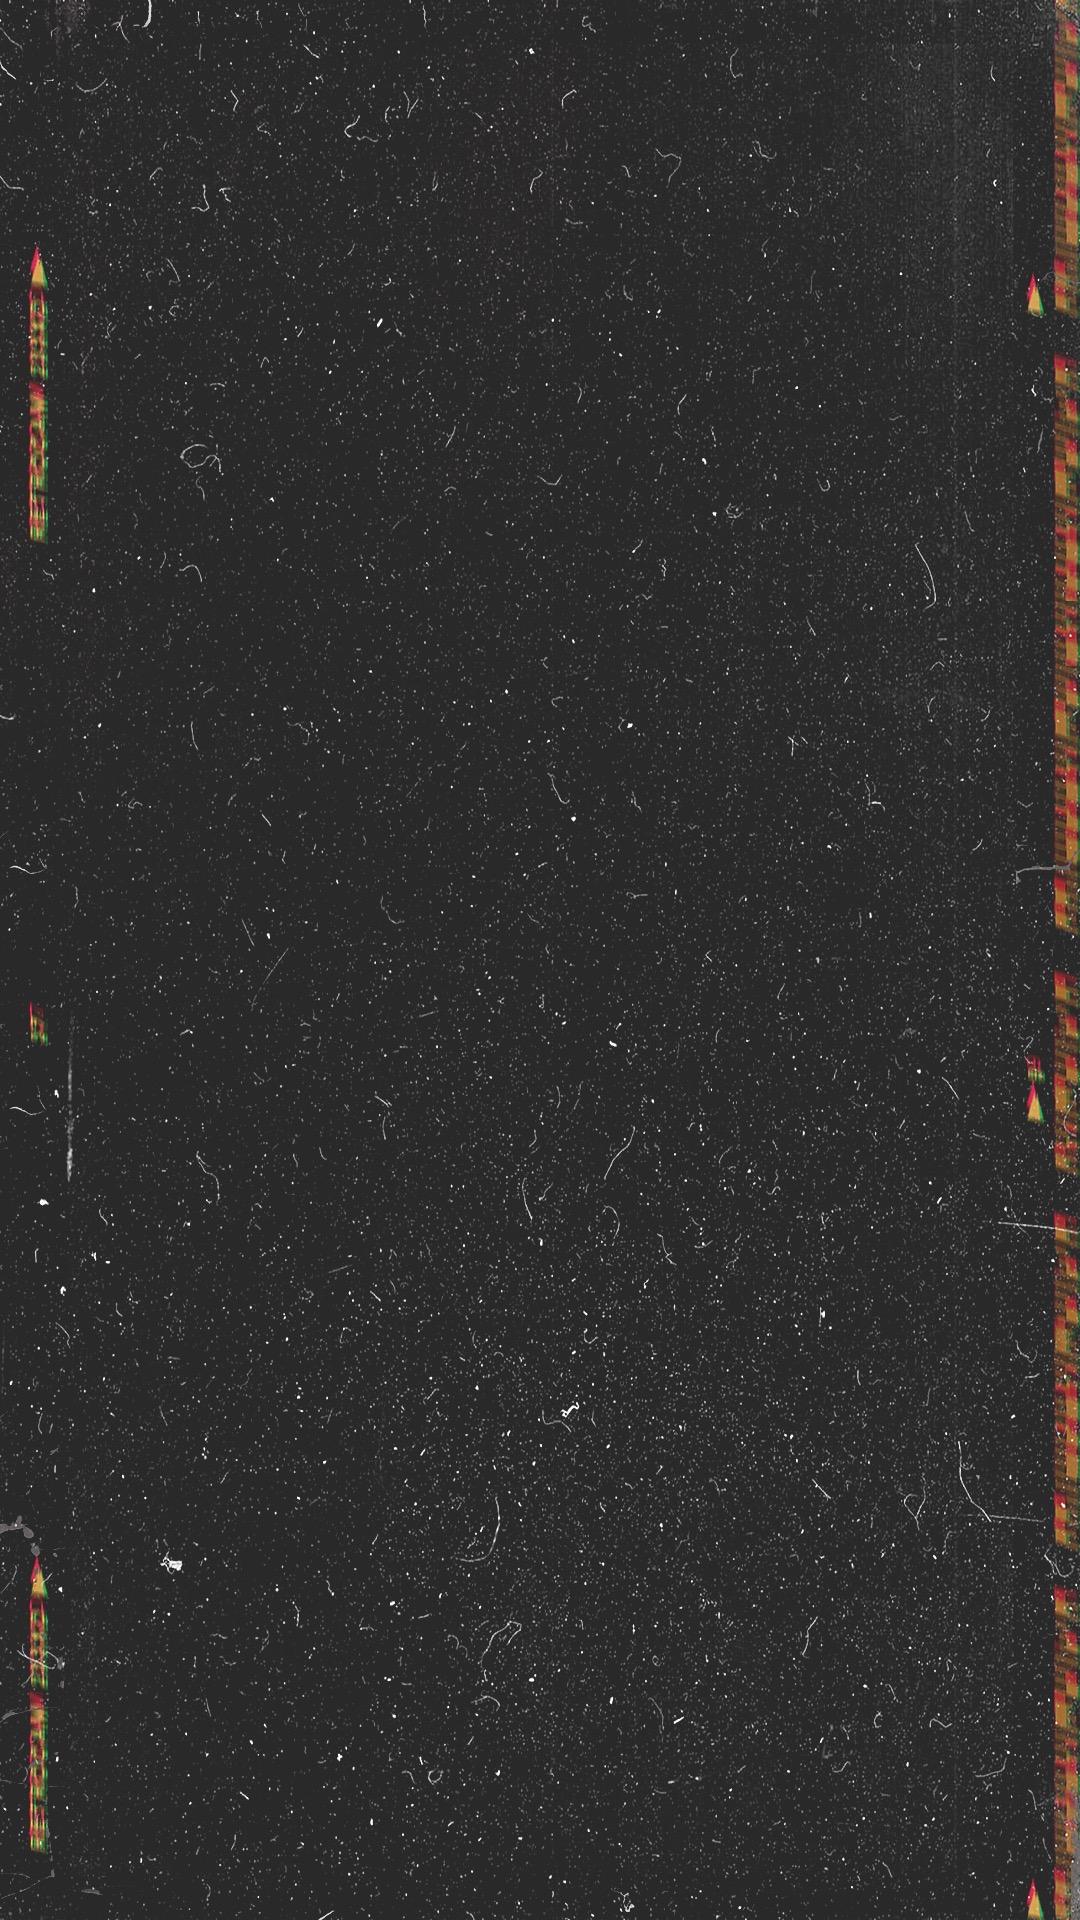 Dark Backgrounds 2 (JPG)